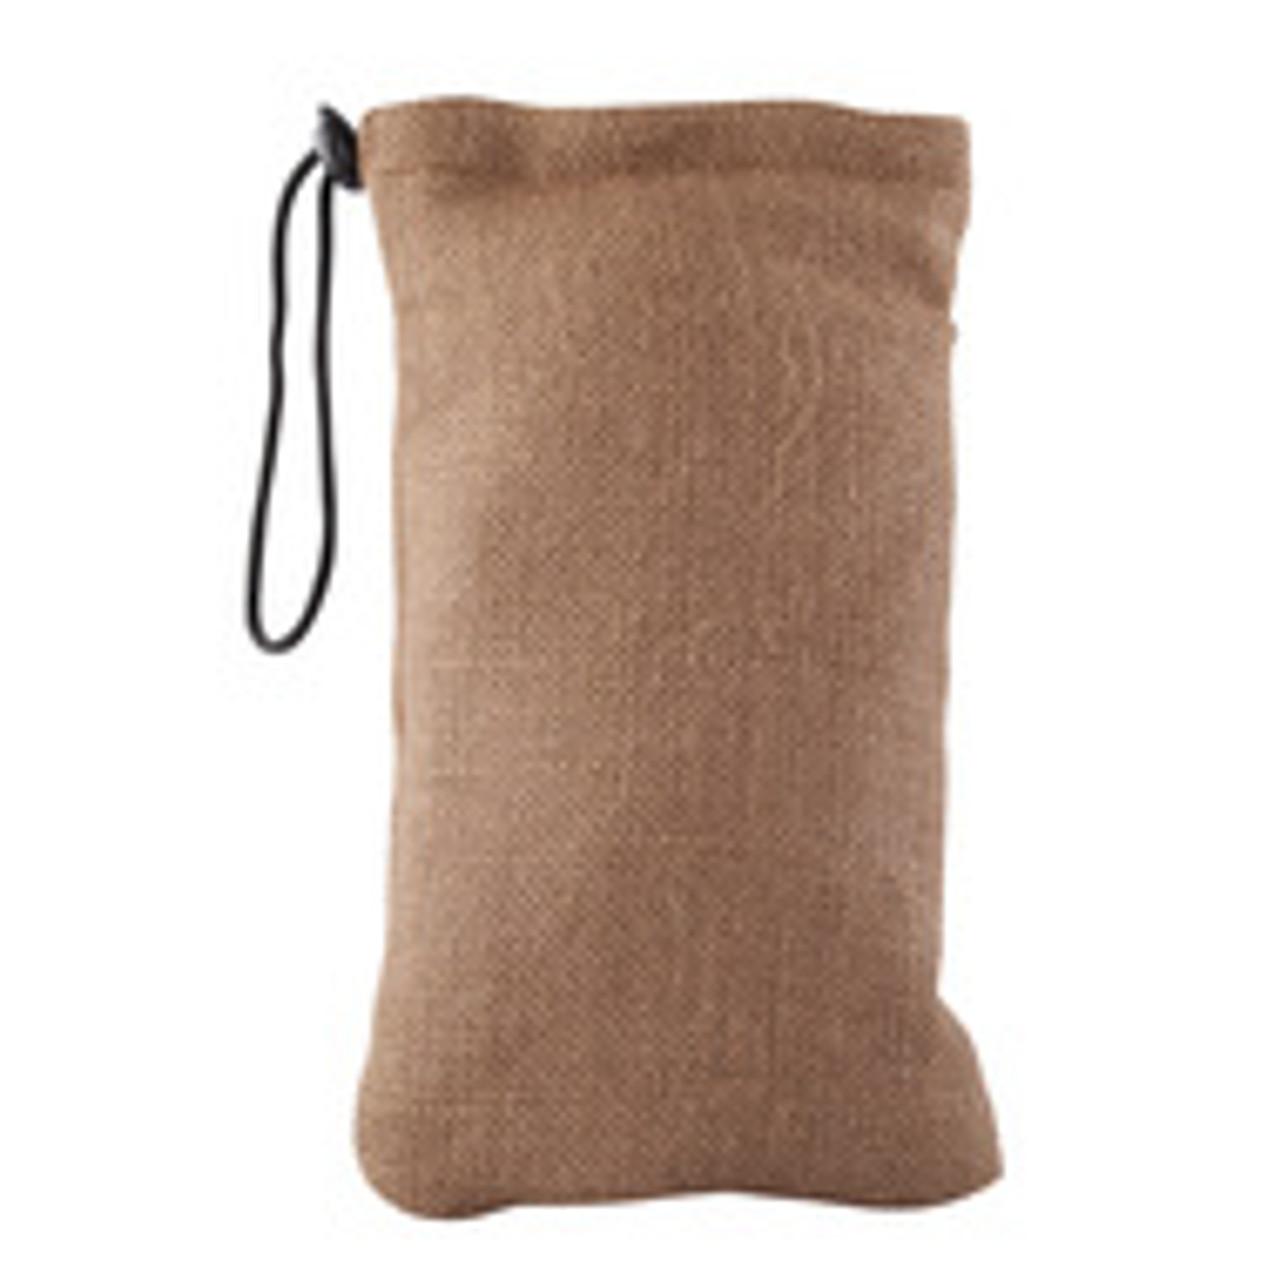 Bug Rugz Drawstring Bags (SM, MED, LG)